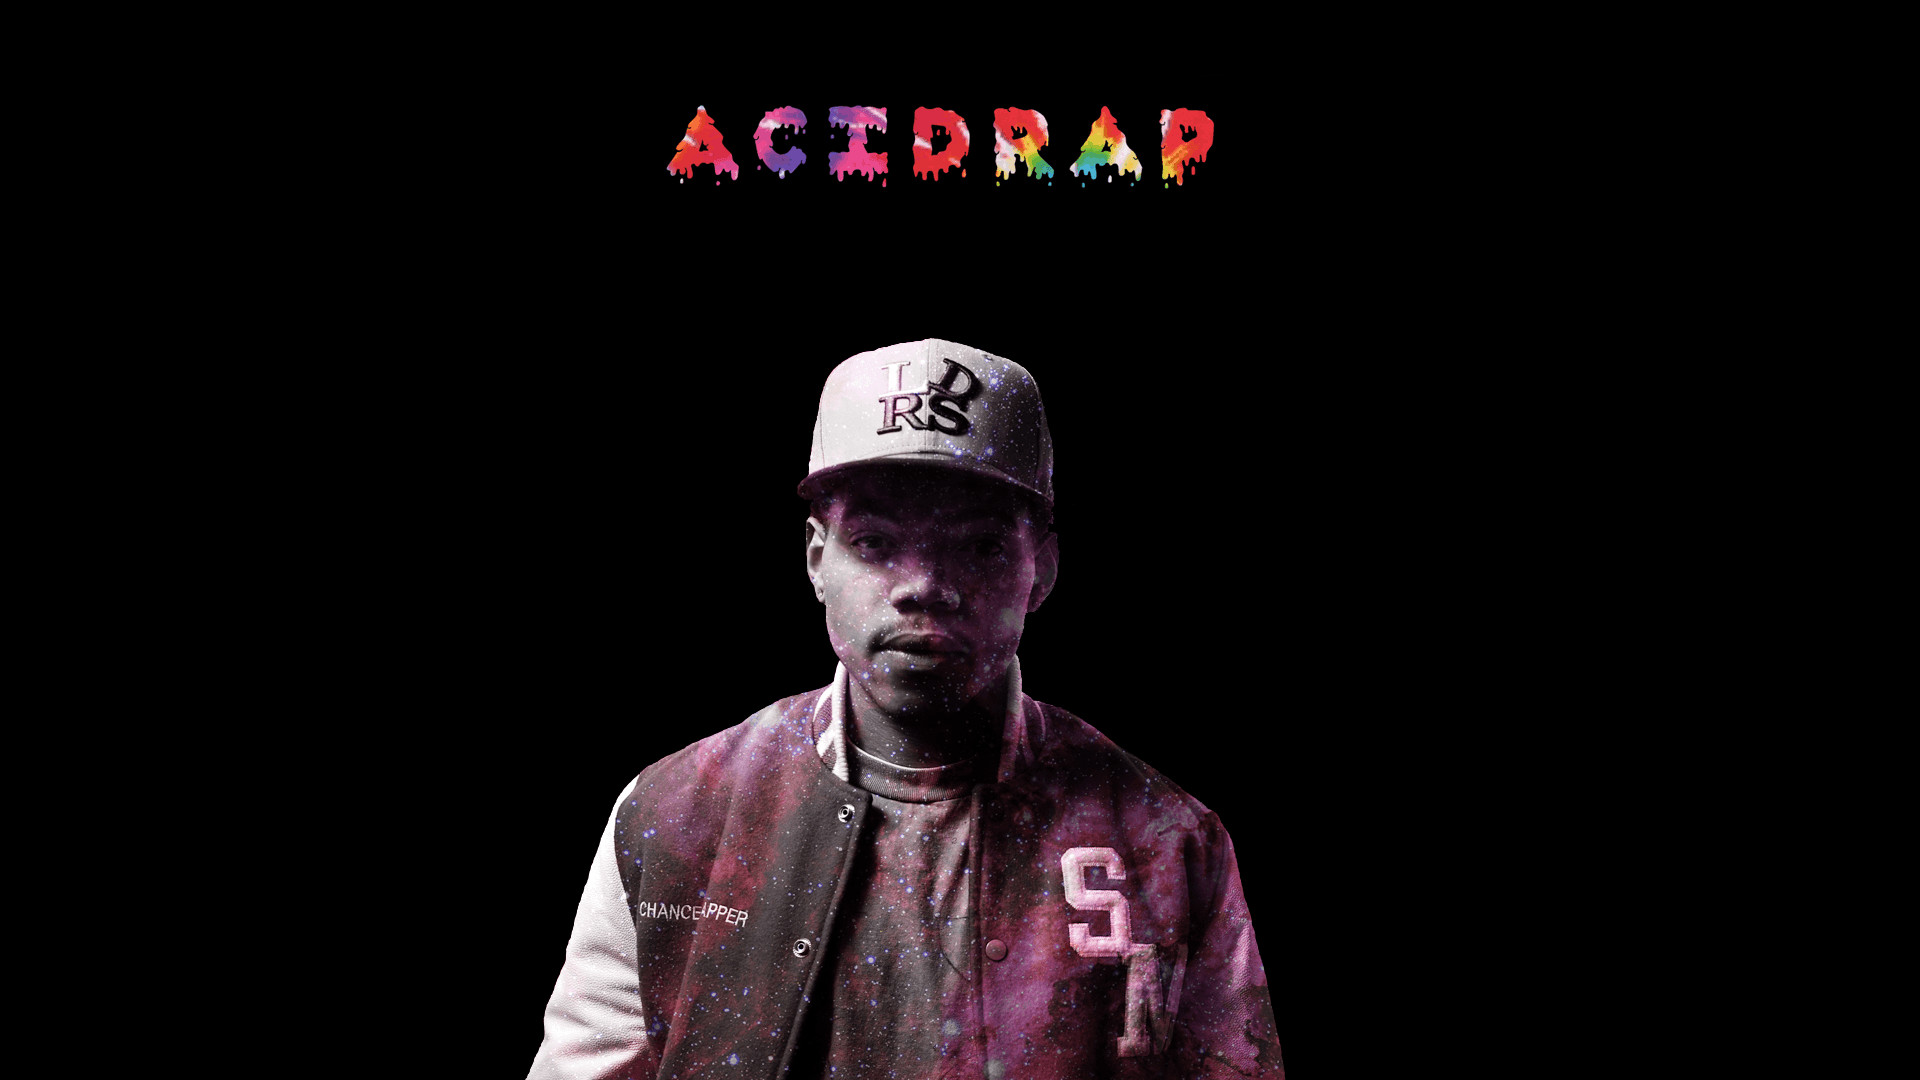 Future Wallpaper Hd Rapper: Rappers Wallpapers (61+ Images